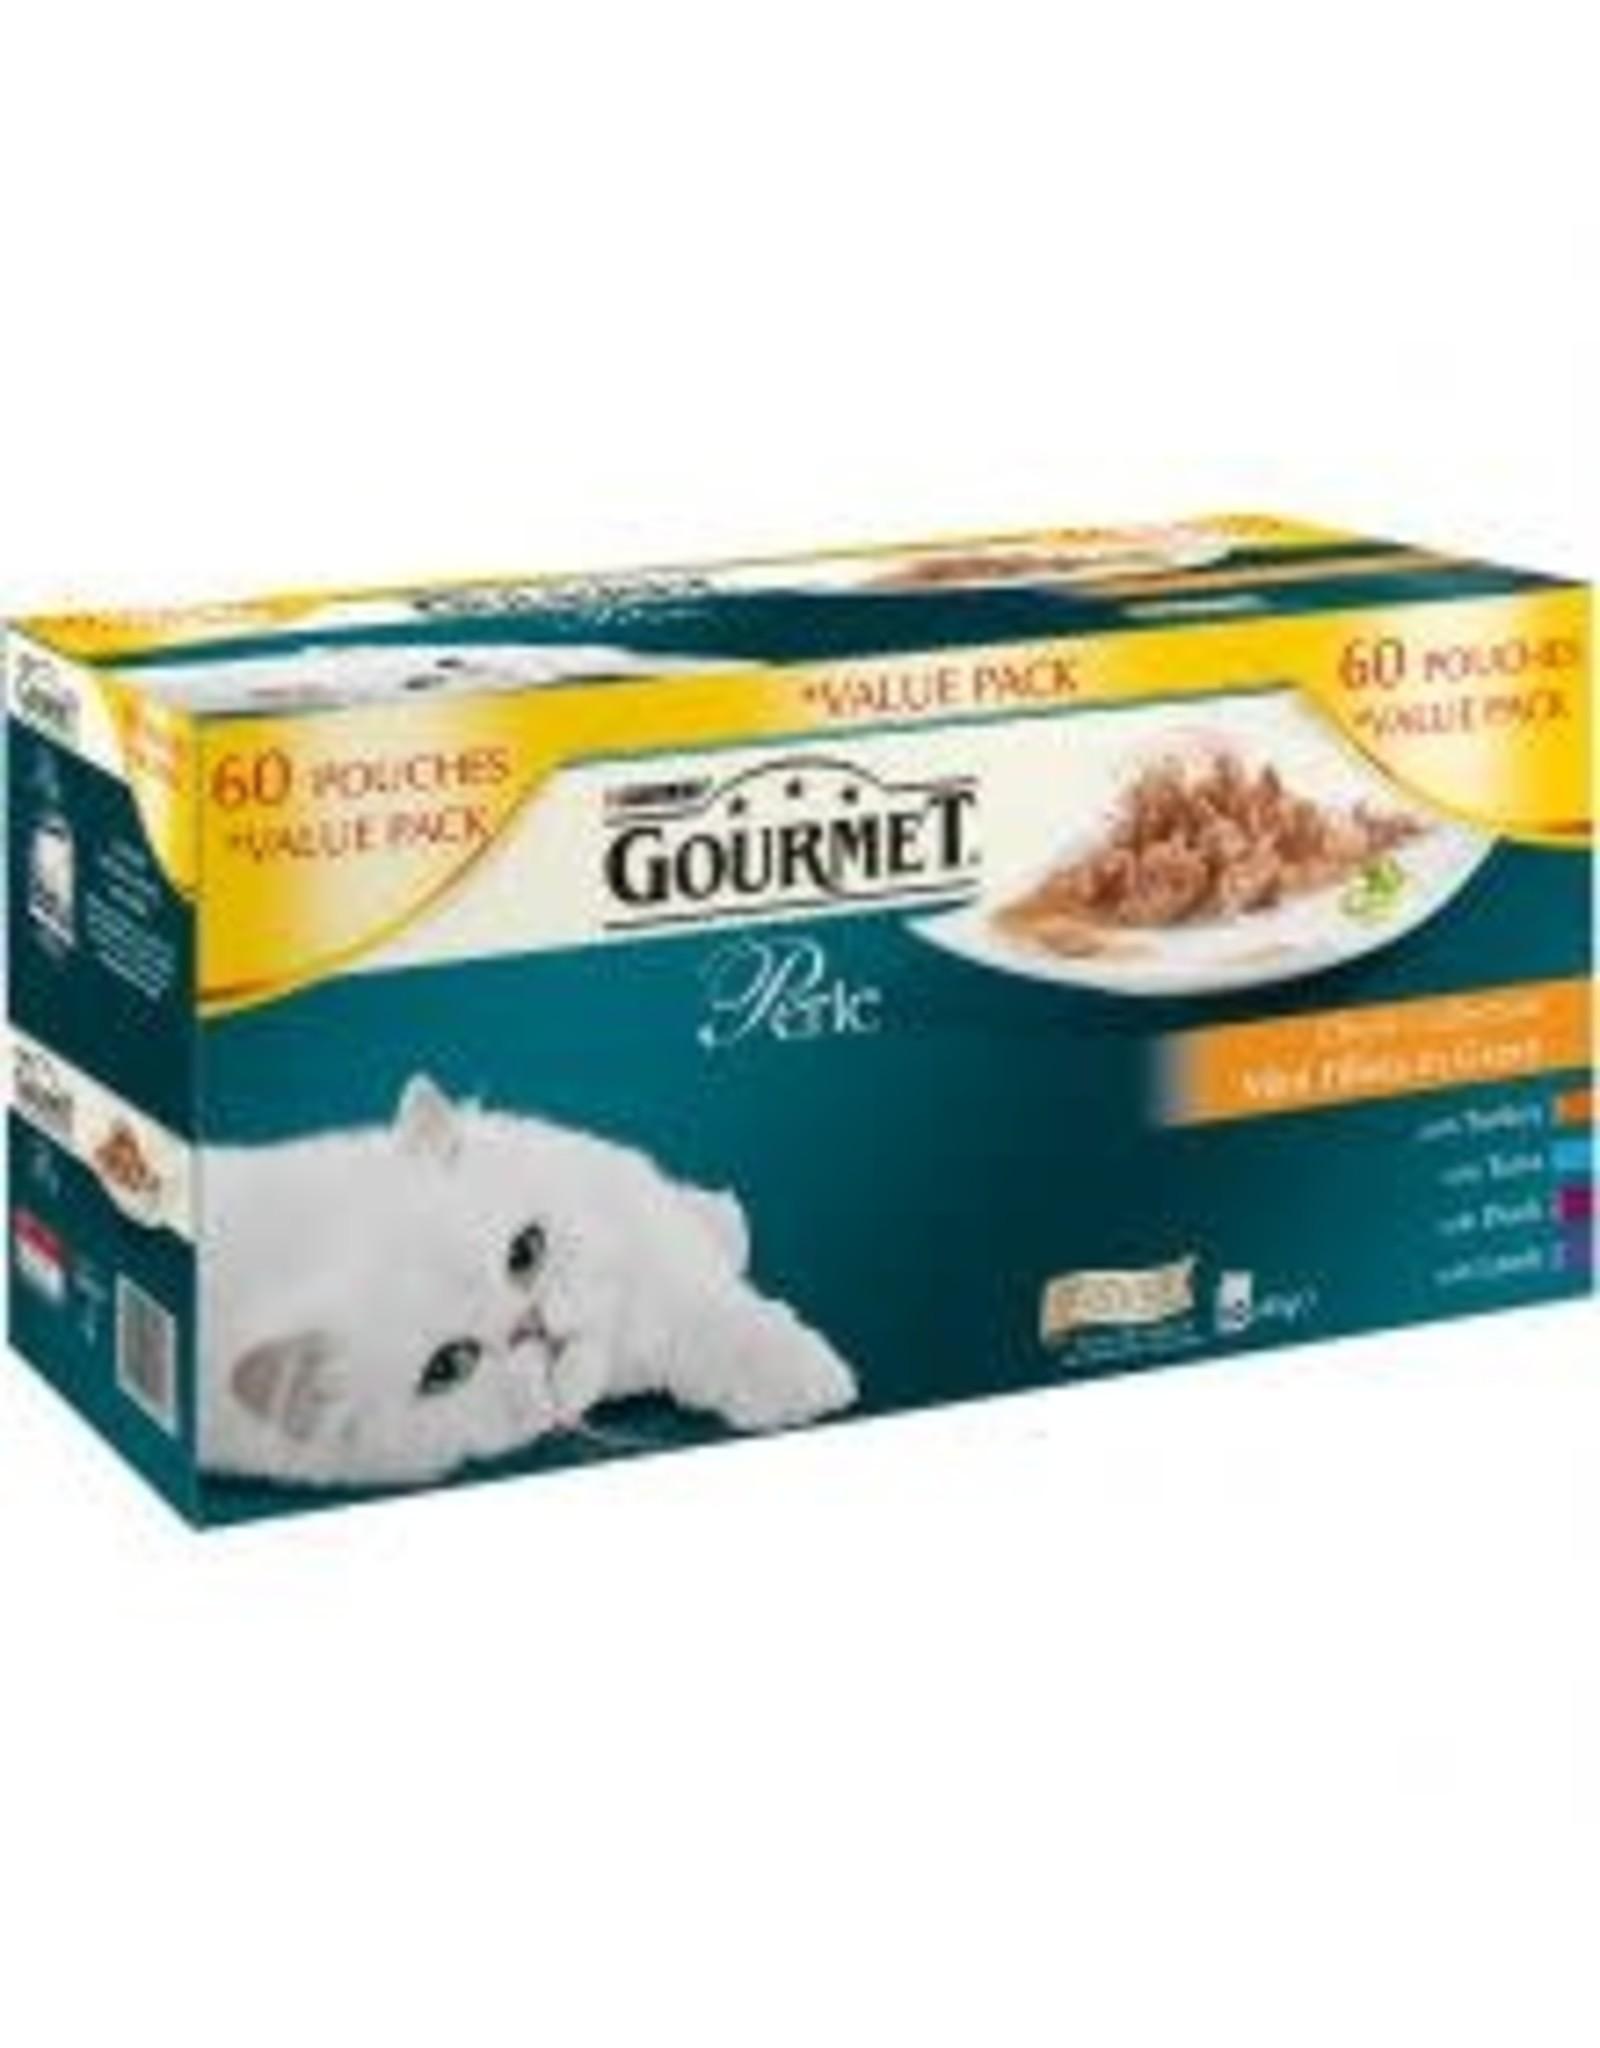 Purina Gourmet Perle Mixed Variety 60 Pack